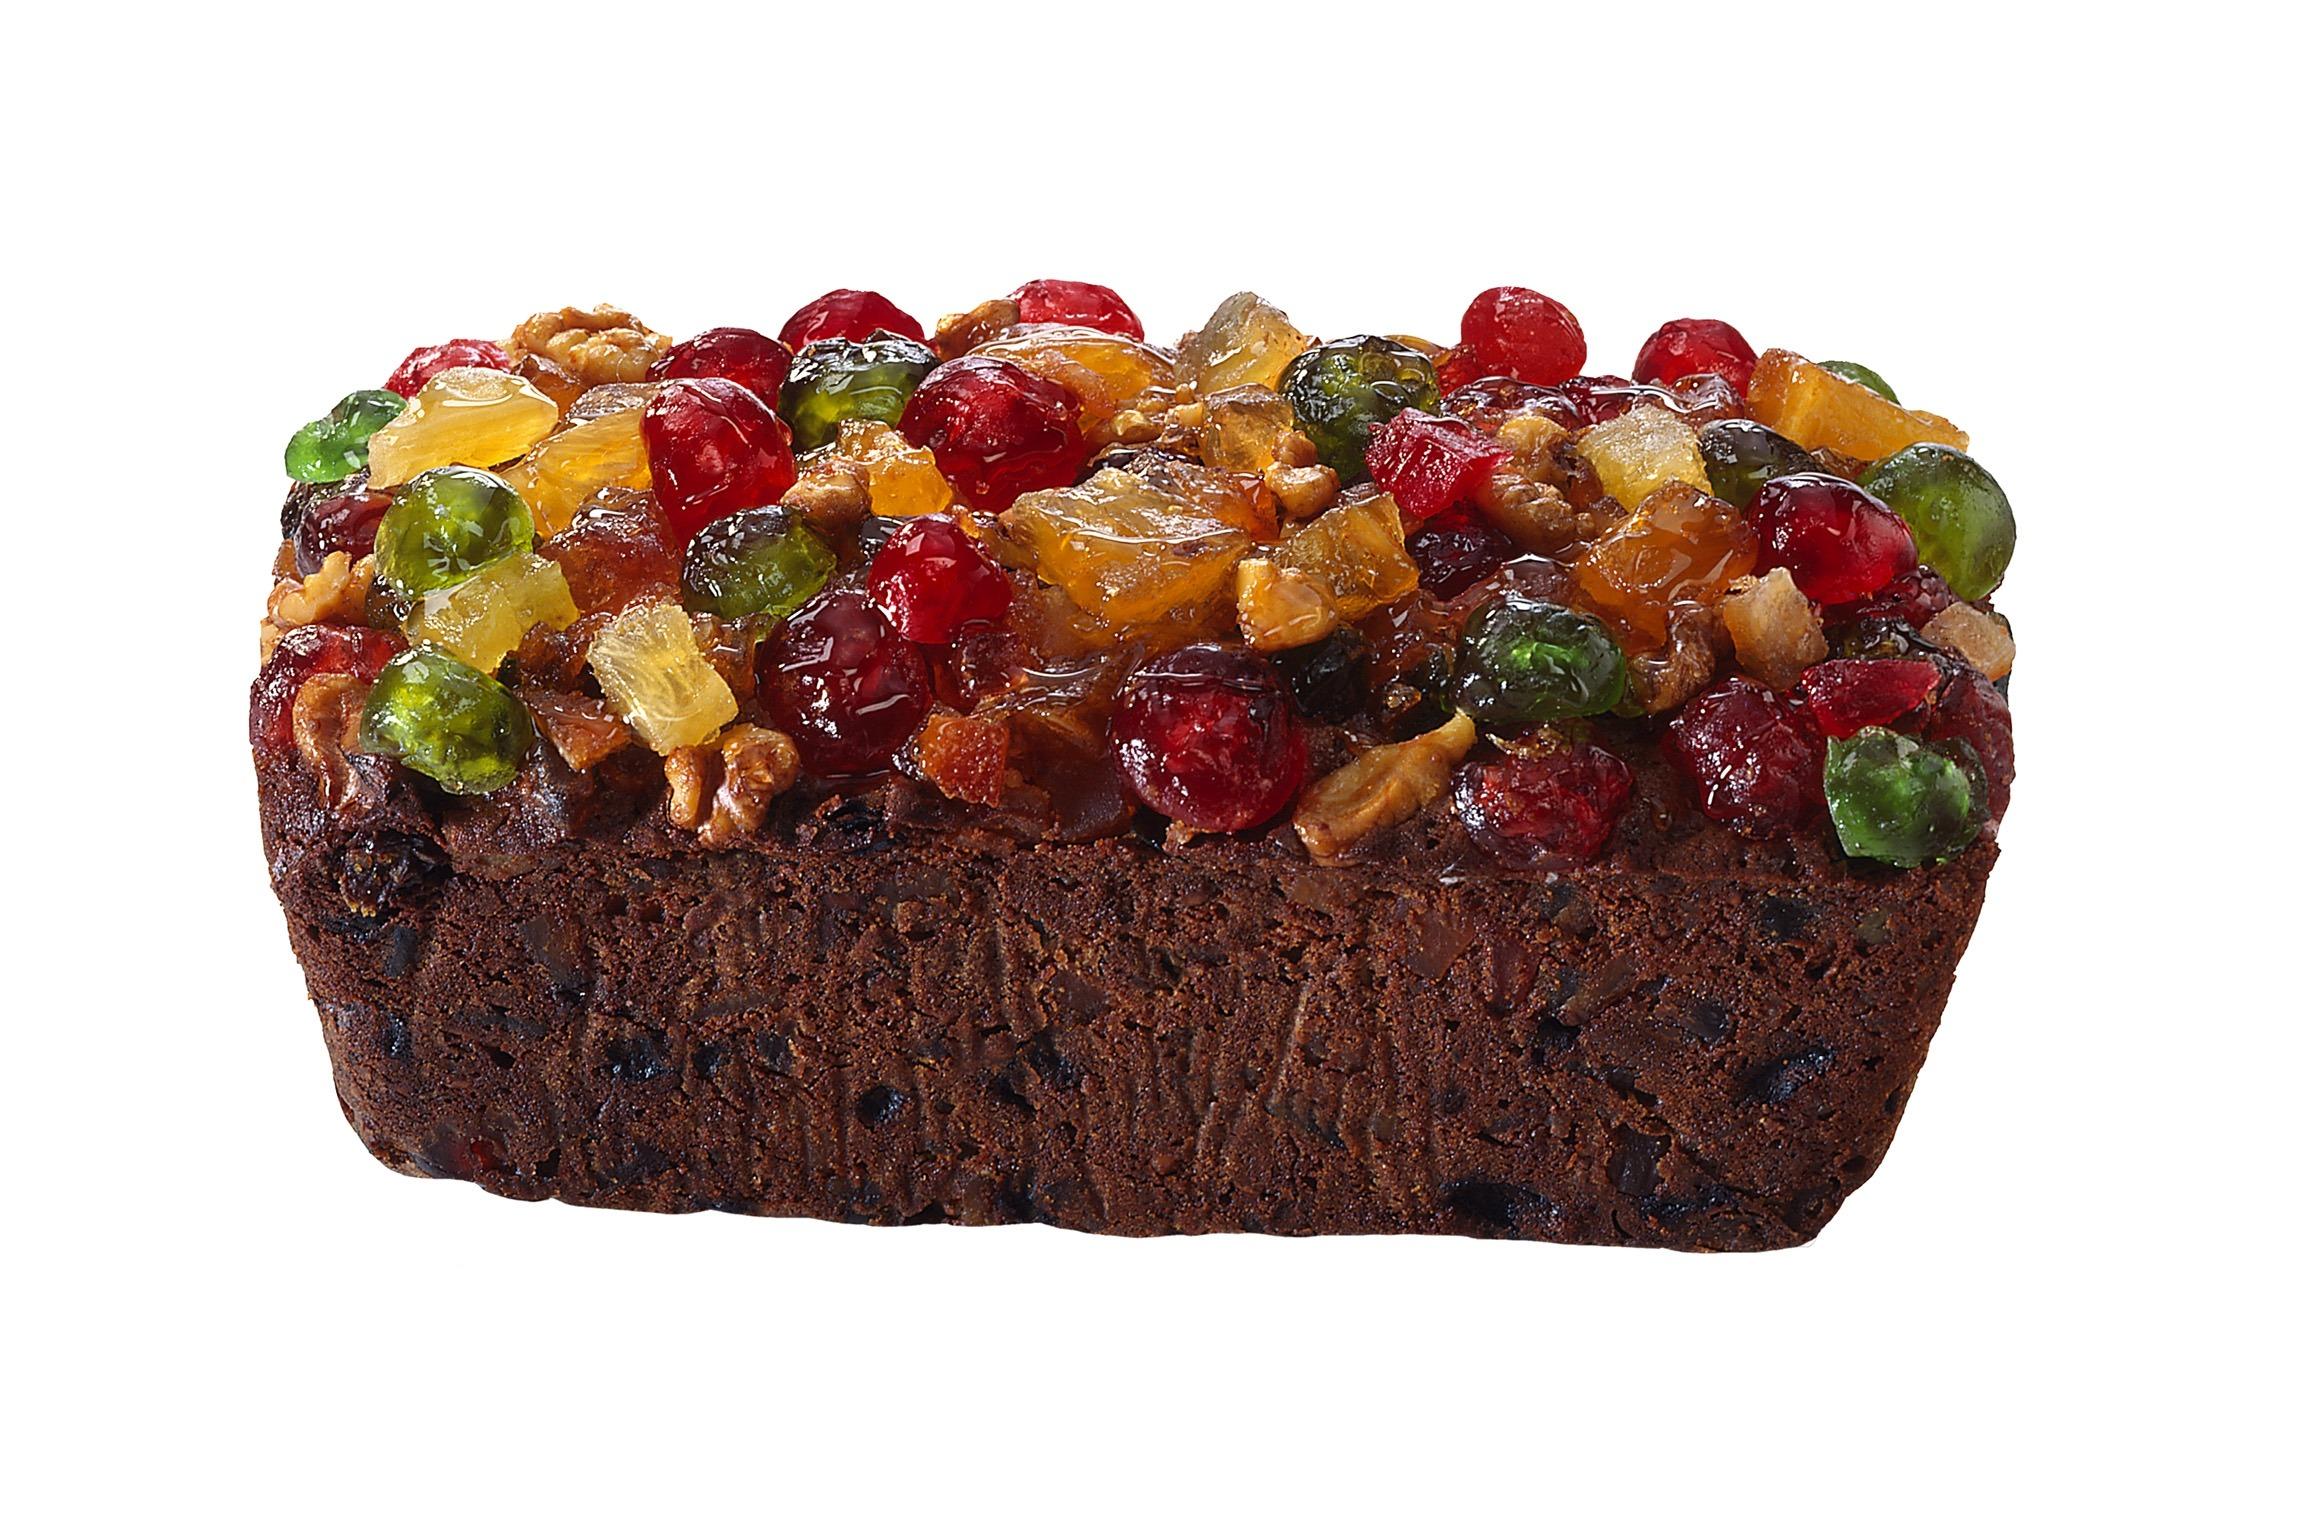 Recipe for belizean black fruit cake